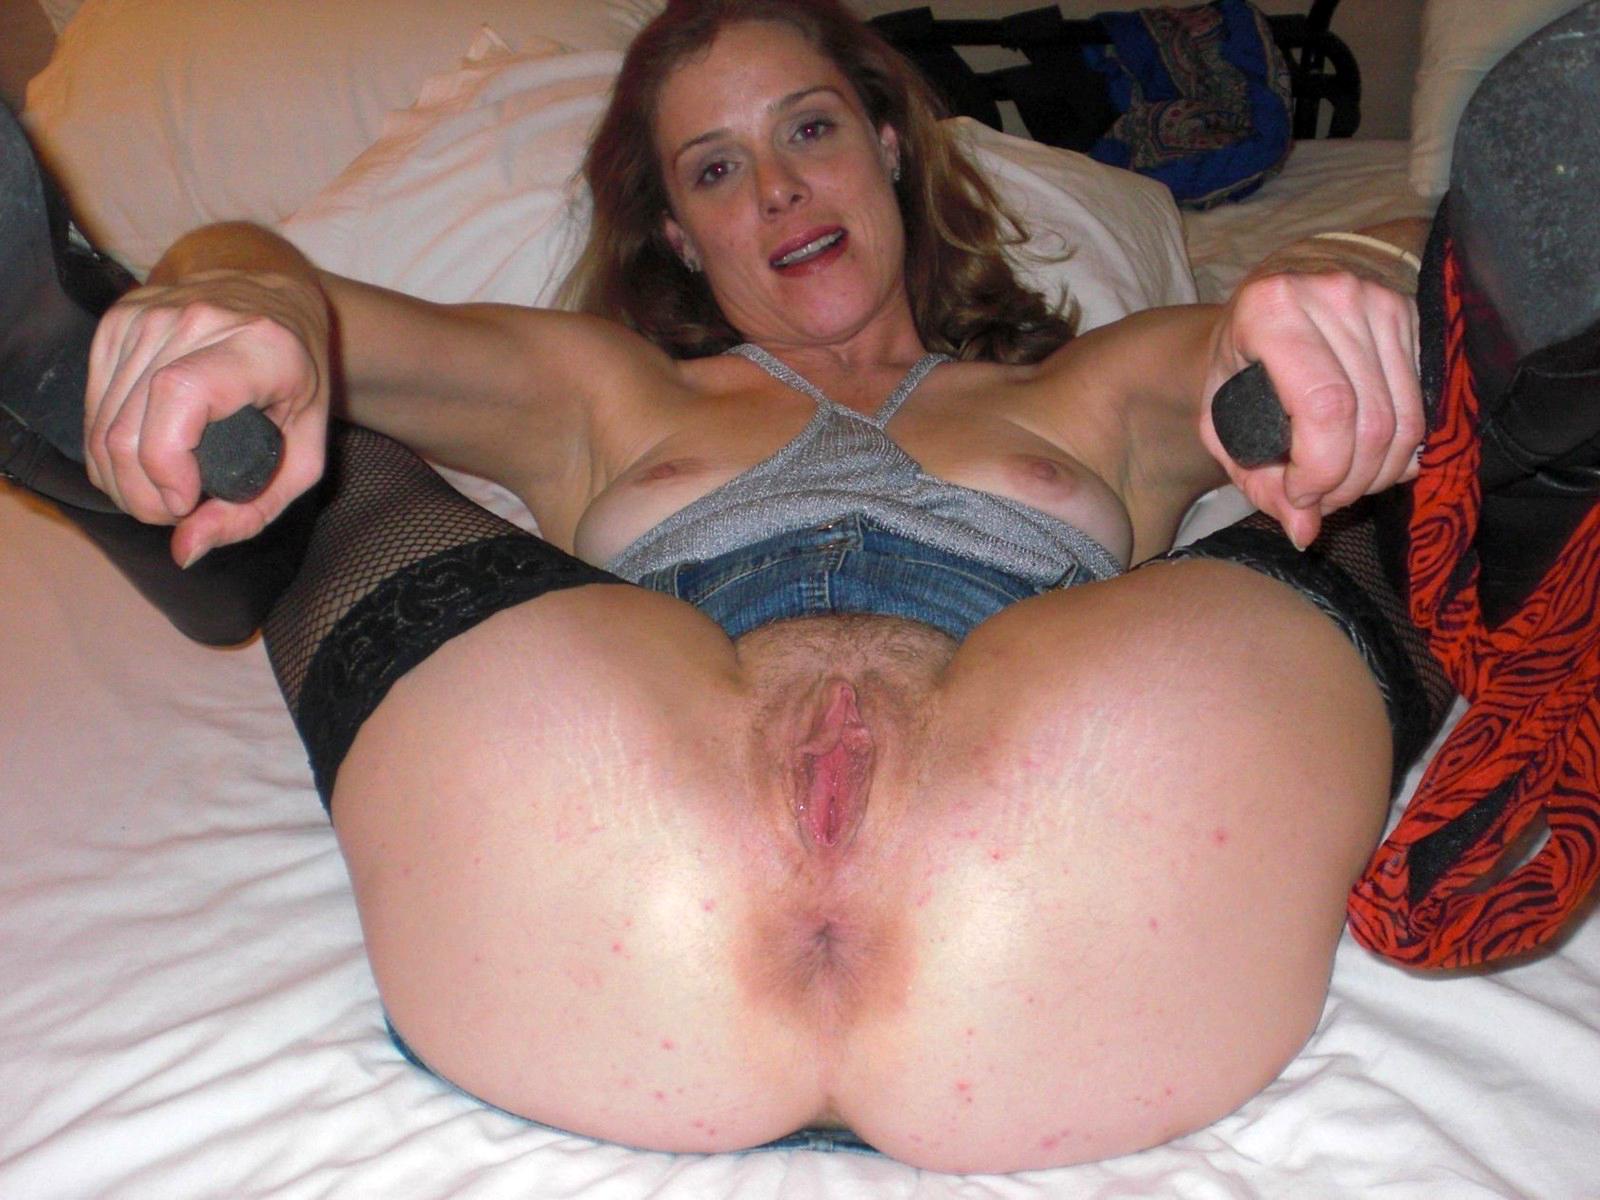 Nice looking jewish girl sucking and fucking